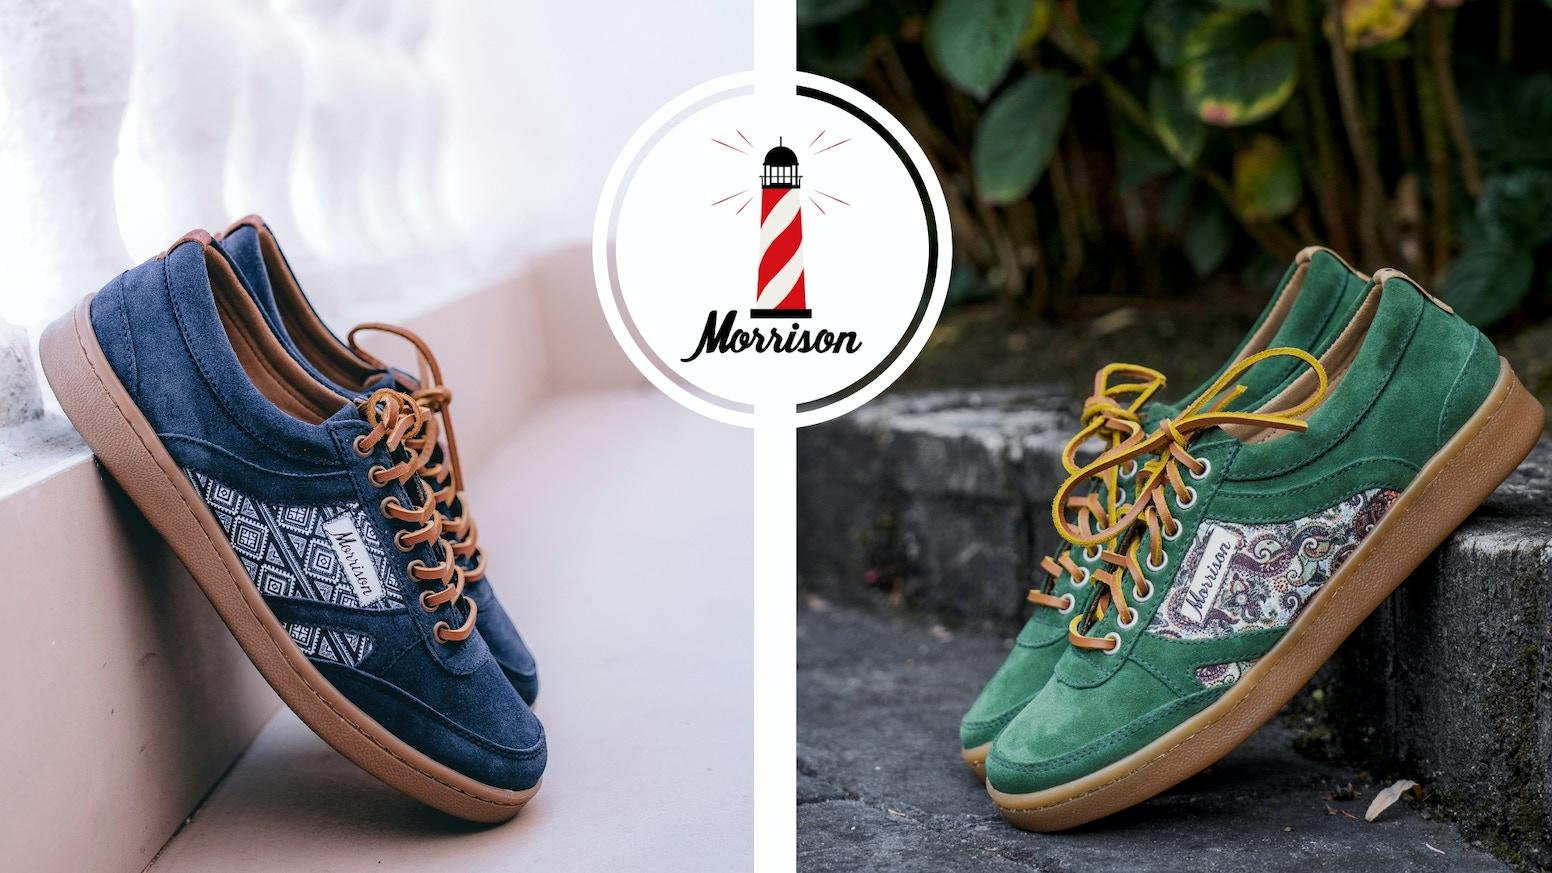 Our upgraded unisex & unique design sneakers, handmade under fair conditions in Europe with premium materials for a maximum comfort